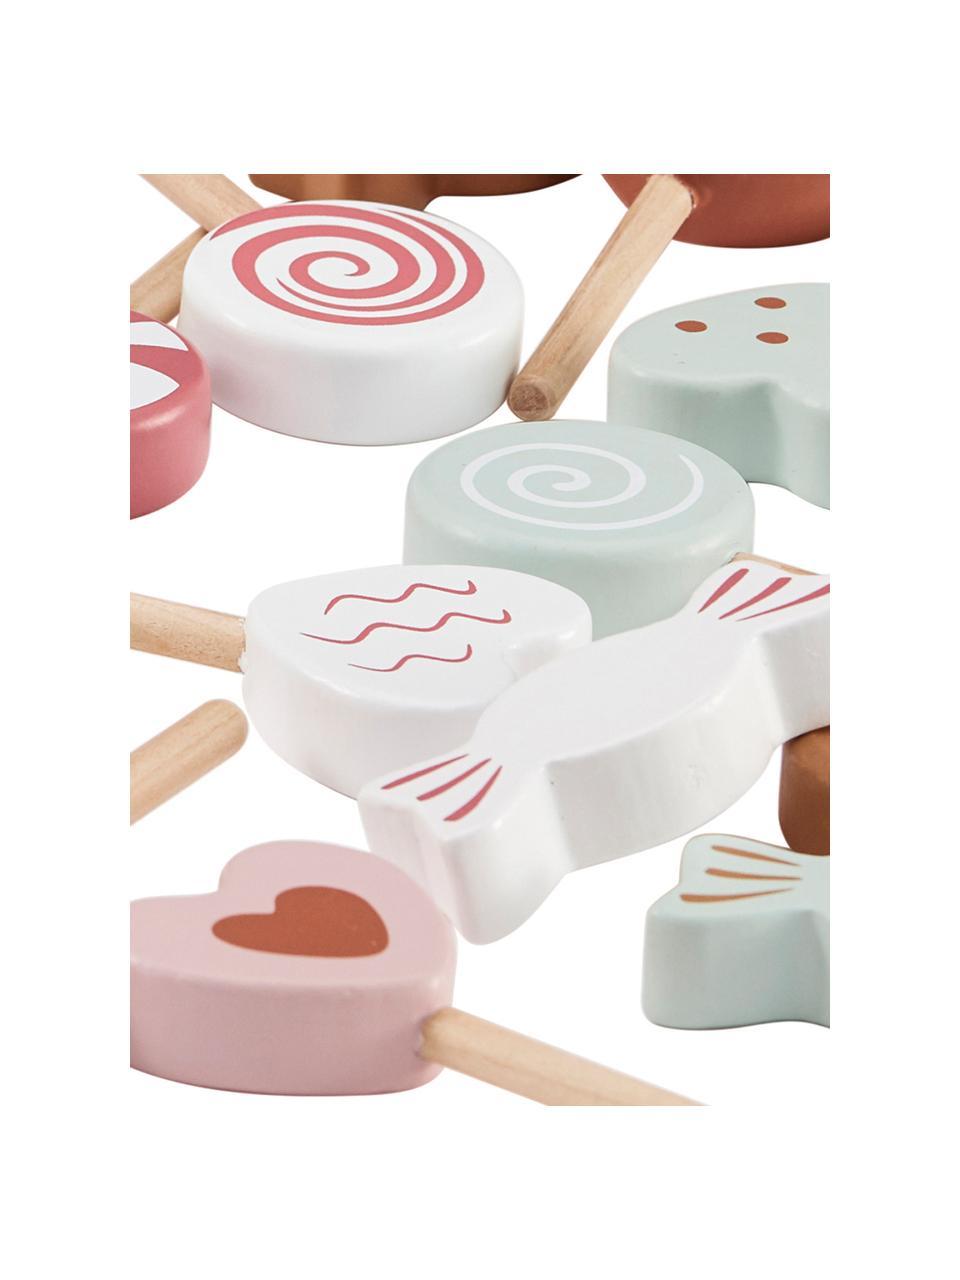 Spielzeug-Set Sweets, Beutel: Baumwolle, Polyester, Mehrfarbig, Ø 16 x H 20 cm